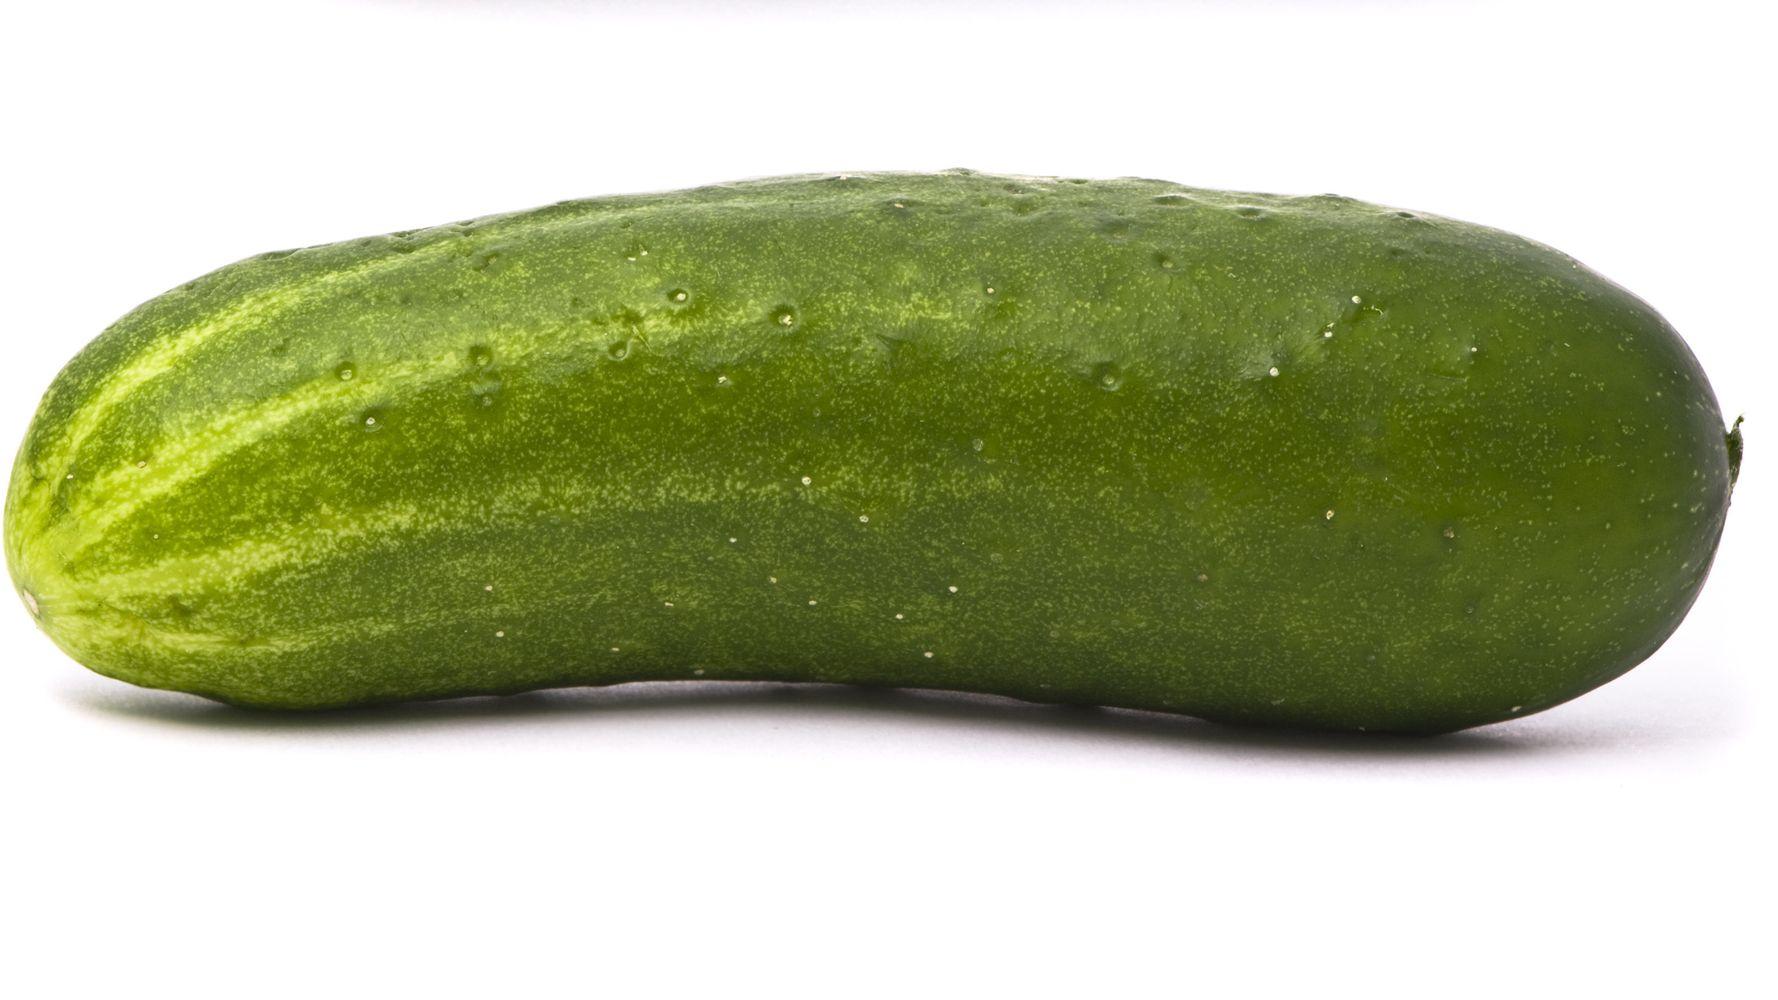 Introducing The Penis Enlargement Implant That 1,300 Men